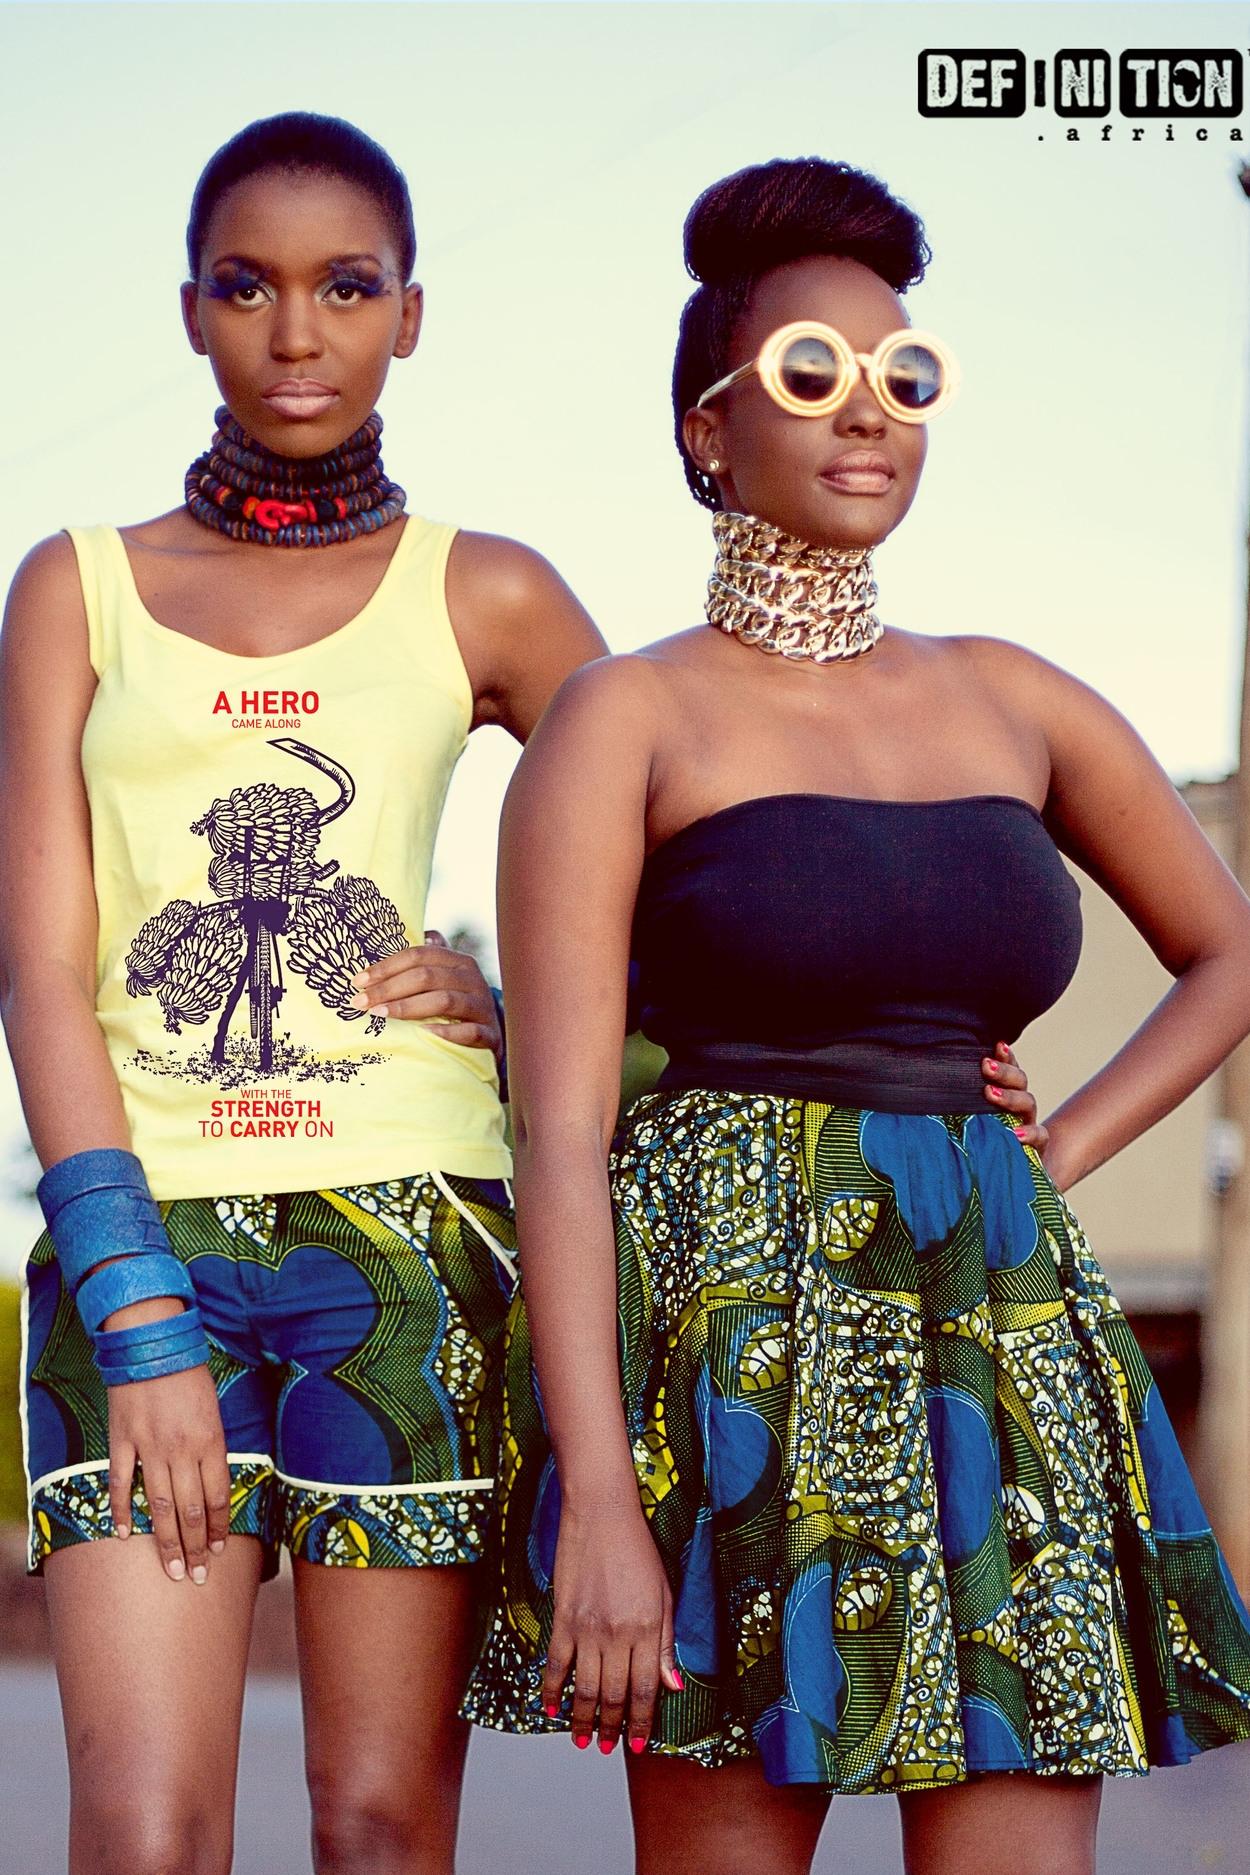 Definition Africa - Vest, Shorts & Skater Skirt - model on the left is wearing Balungi bracelets & necklace.jpg